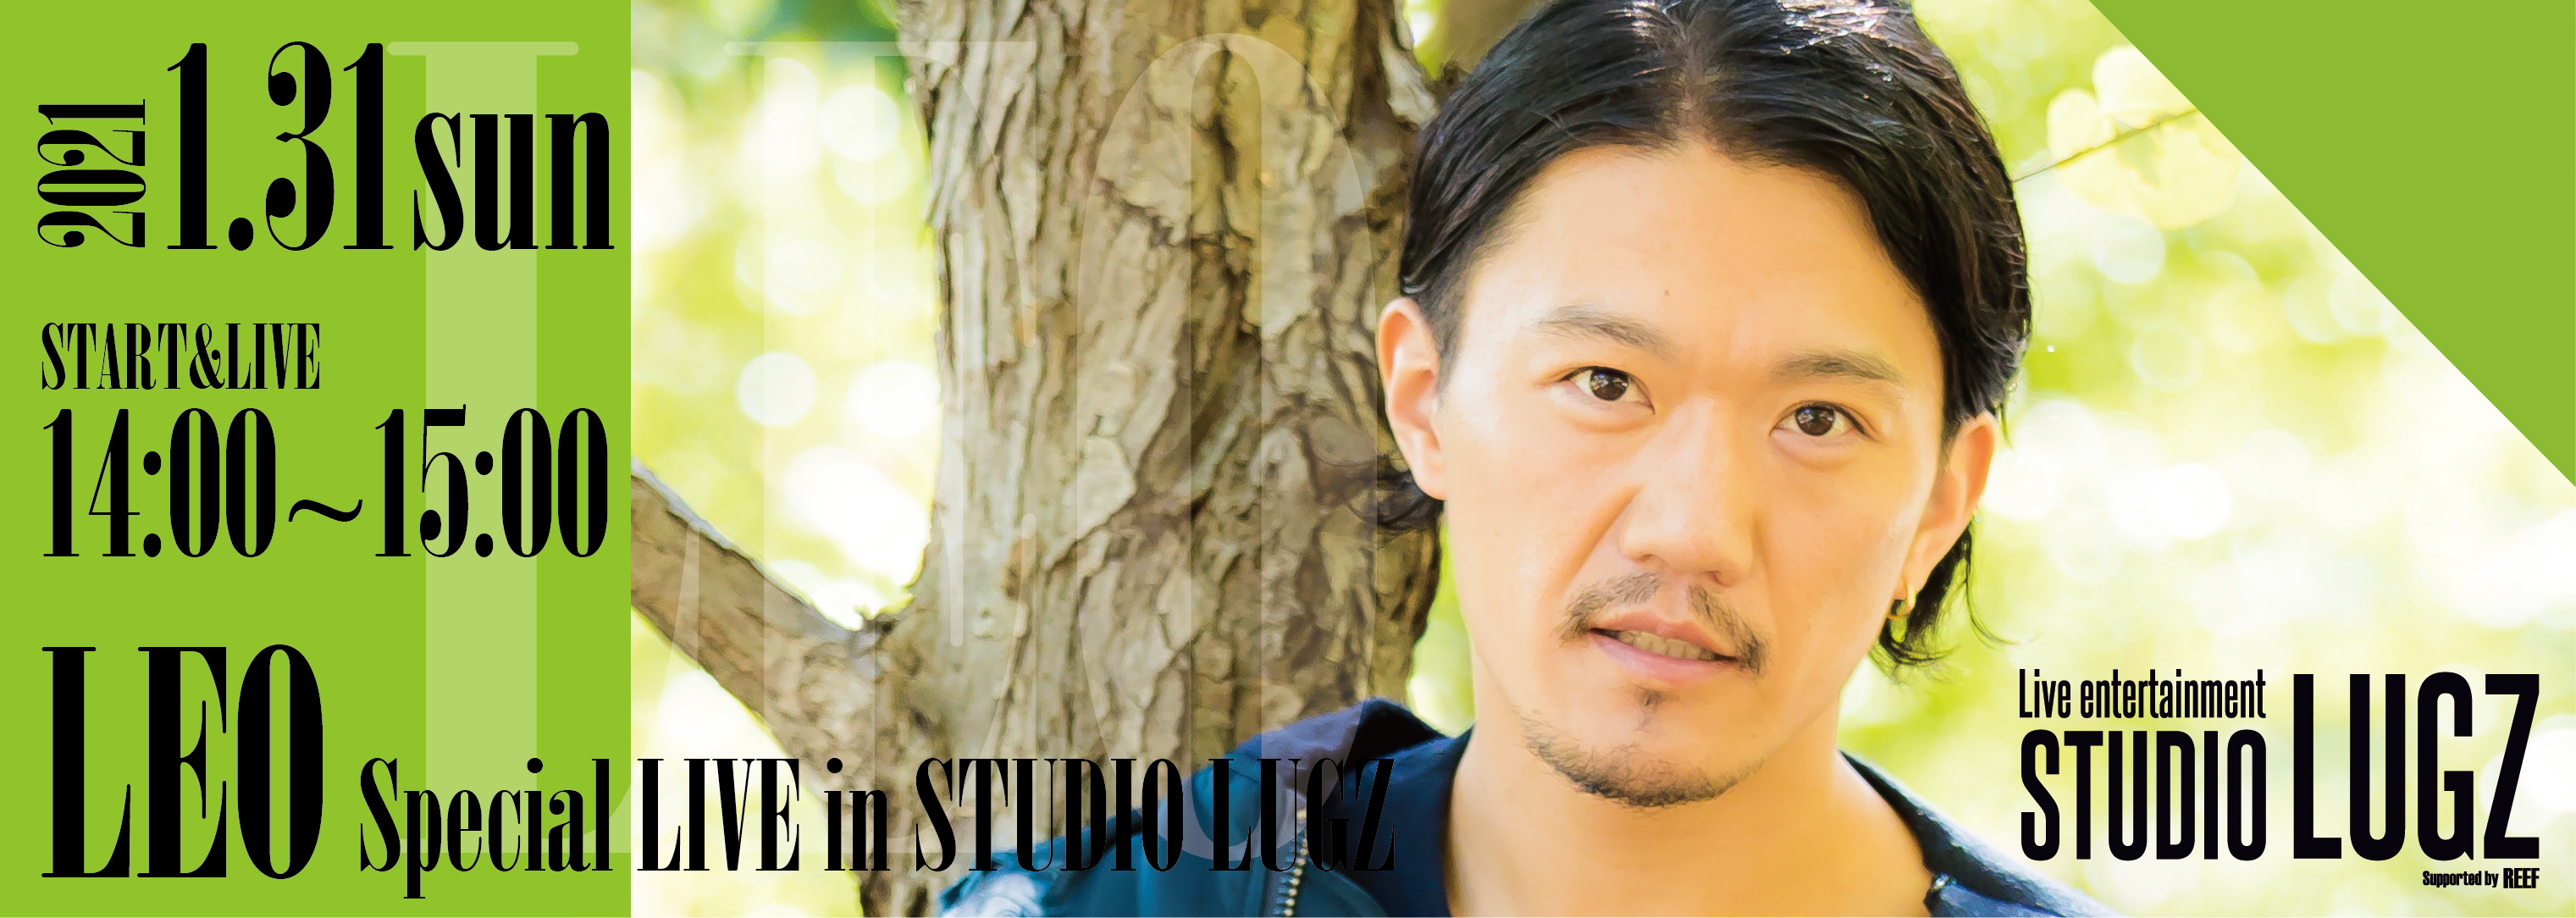 LEO Special LIVE in STUDIO LUGZ